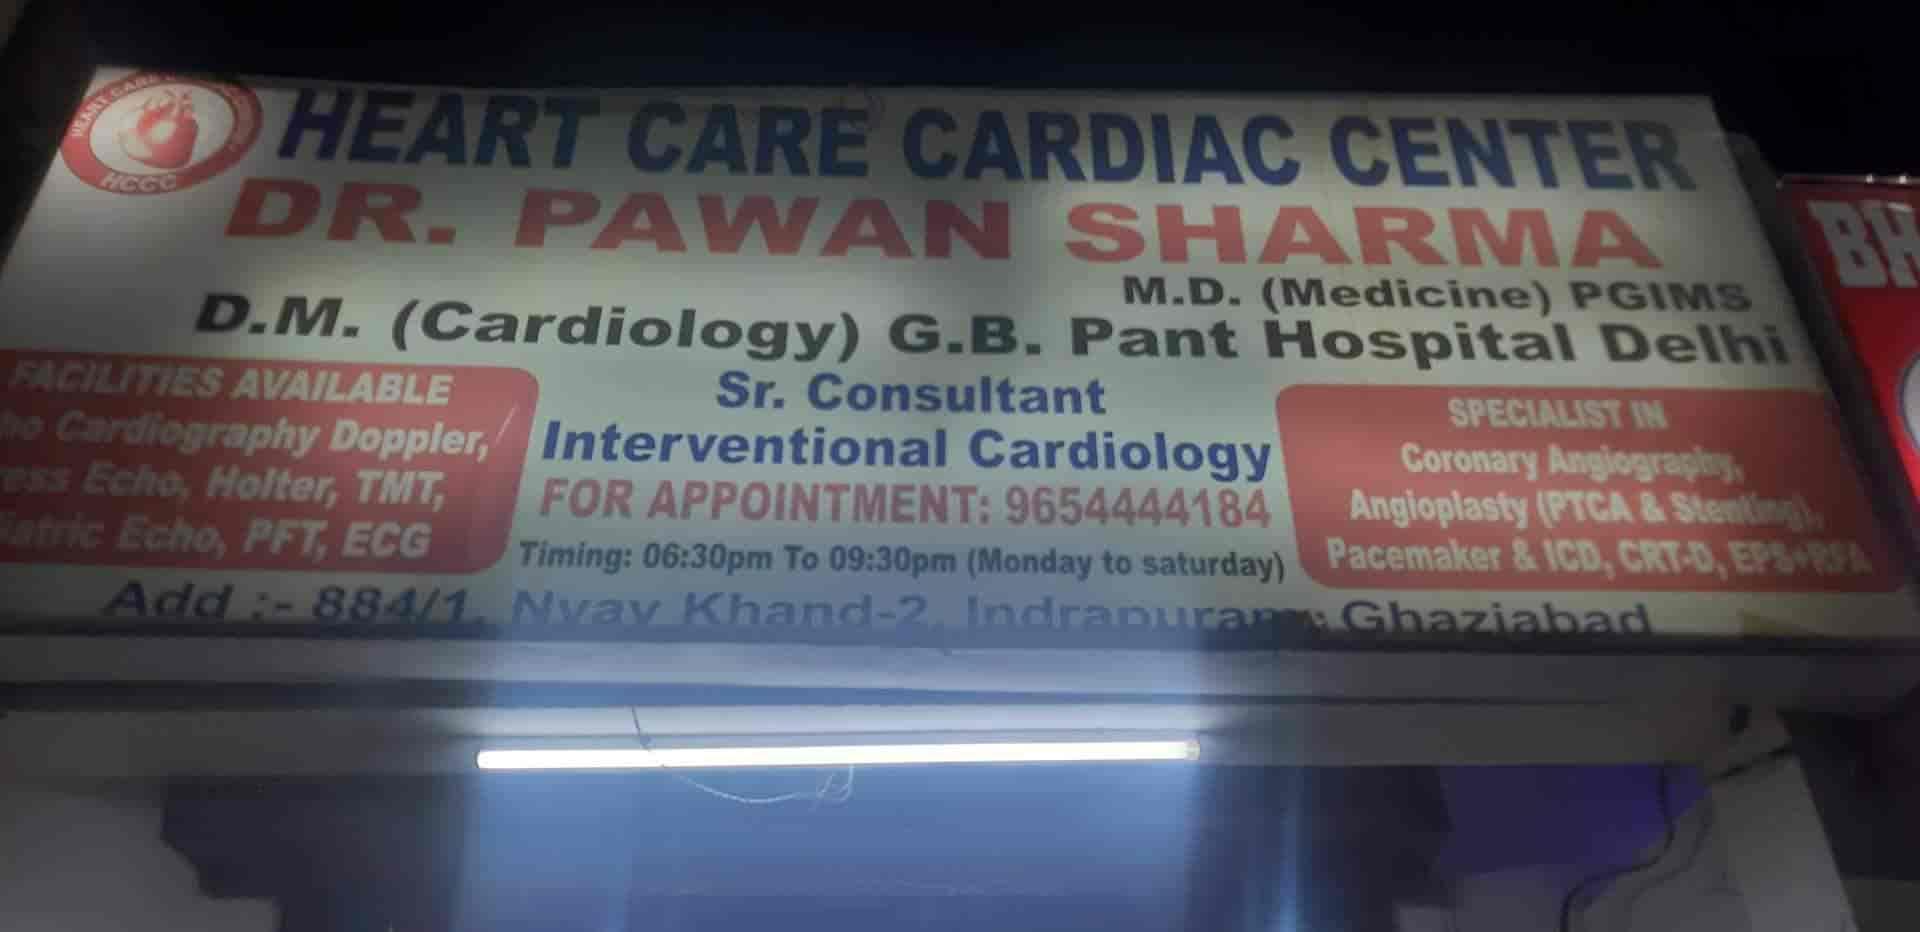 Heart Care Cardiac Center Nyay Khand 2 Indirapuram Hospitals In Ghaziabad Delhi Justdial